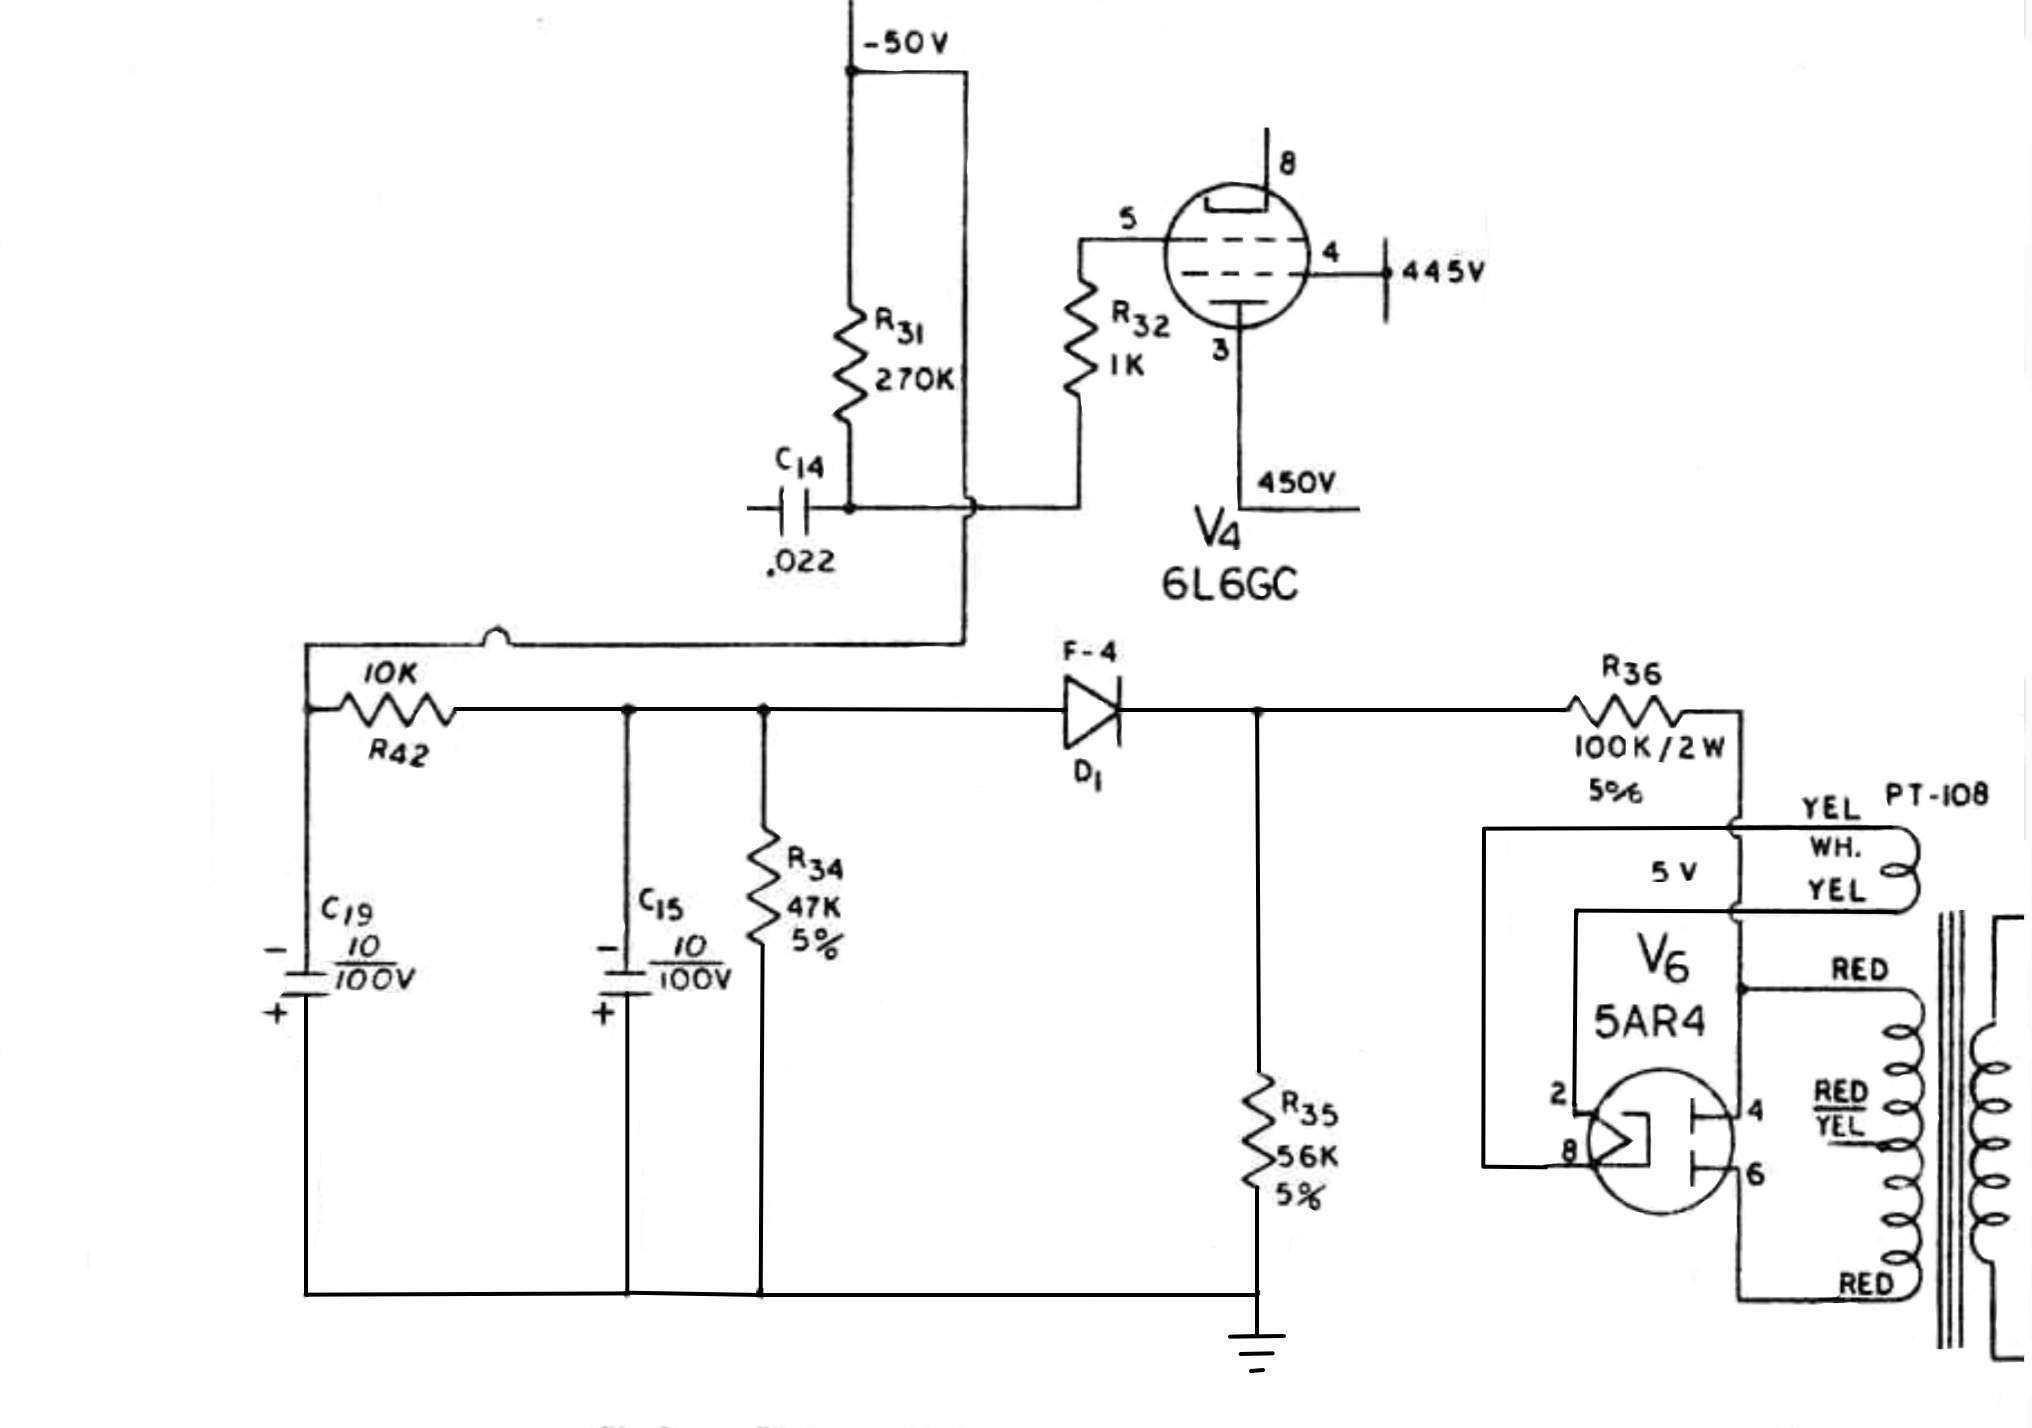 Potentiometer Circuit Diagram and Working Inspirational Potentiometer Circuit Diagram Beautiful Technical Amplifier Potentiometer Circuit Diagram